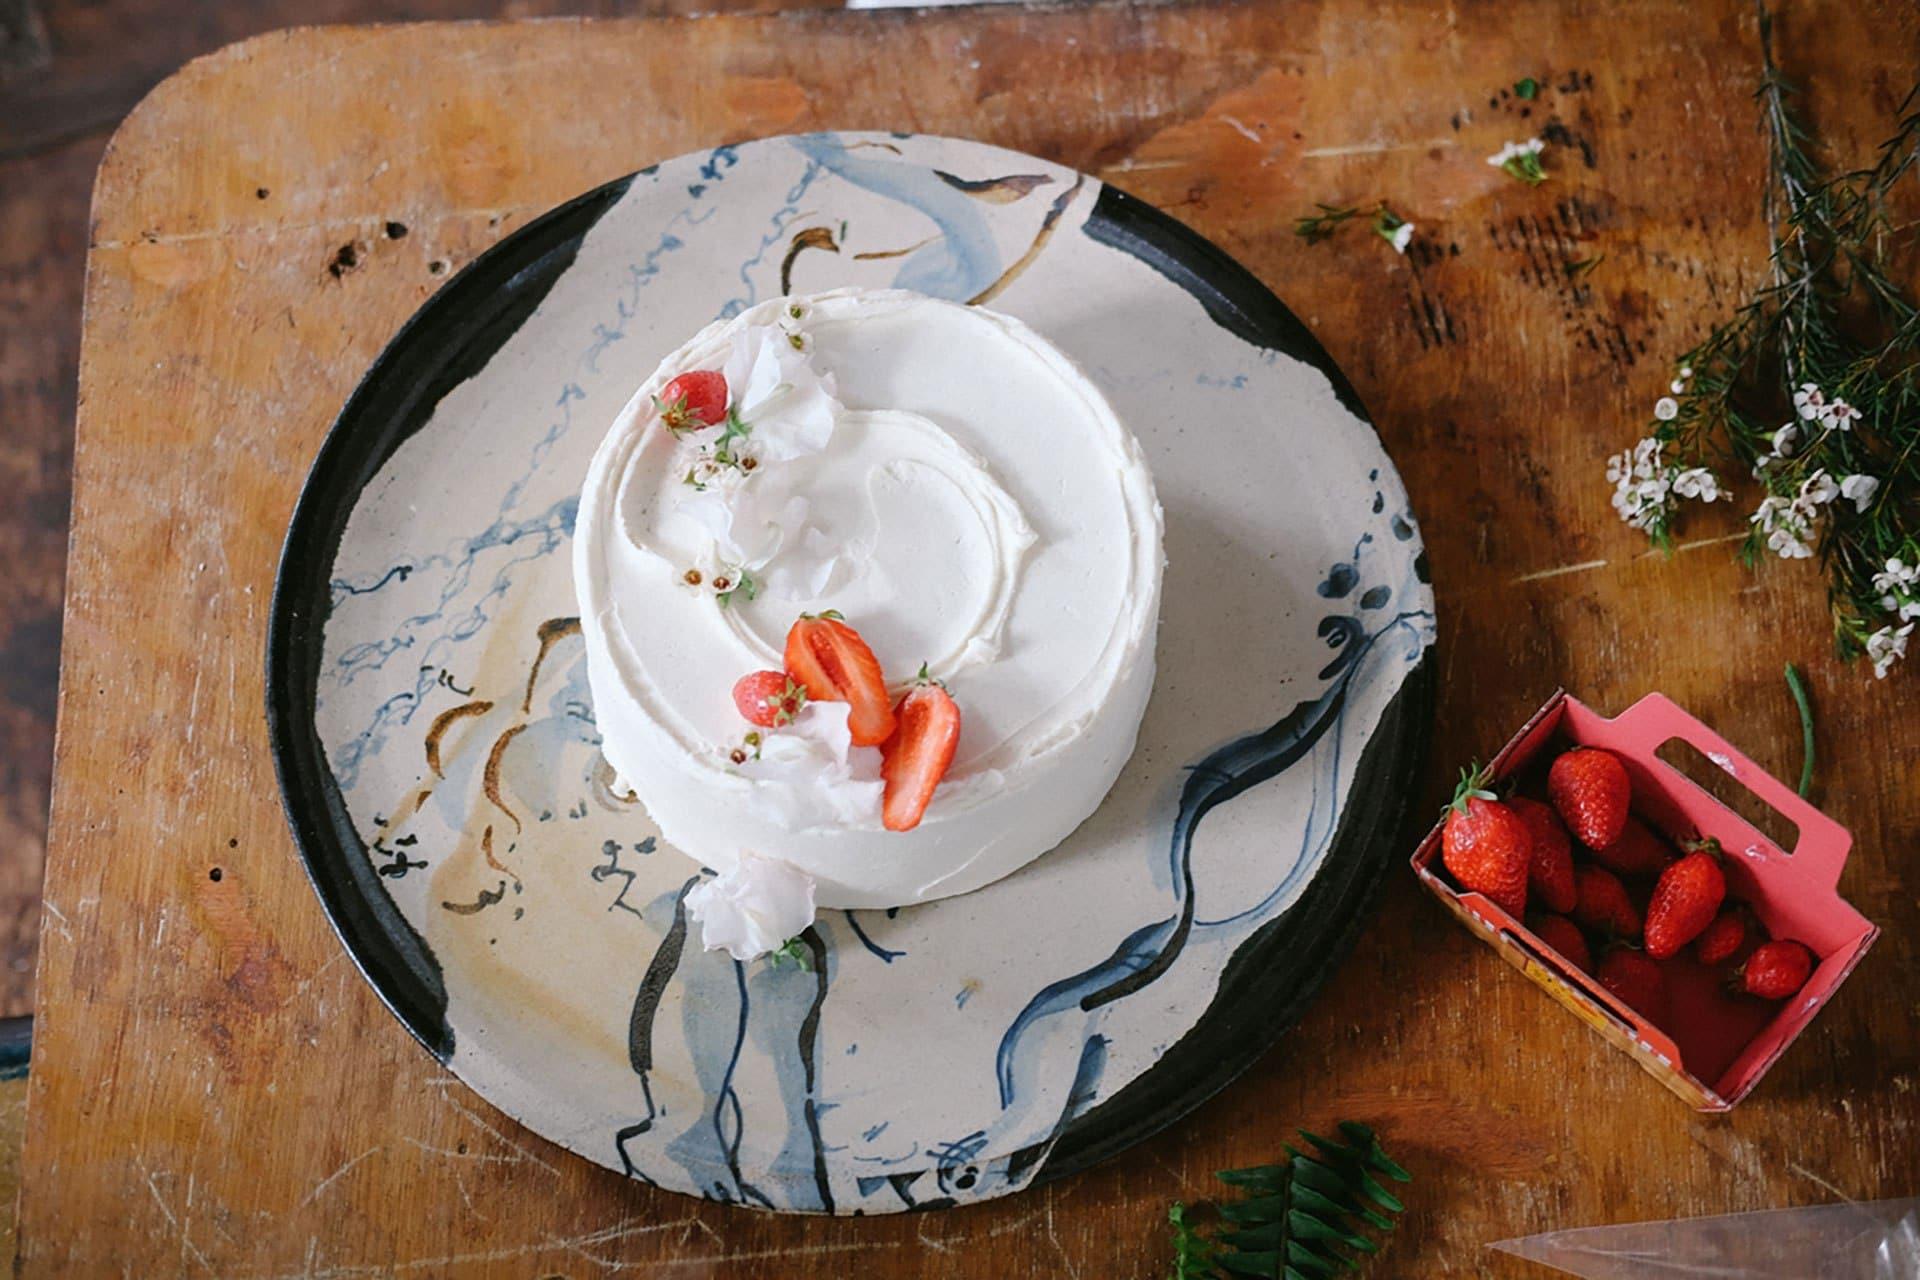 The lemon and elderflower sponge cake that was served at Prince Harry and Meghan Markle's wedding reception. Image credit: Sophie Davidson.